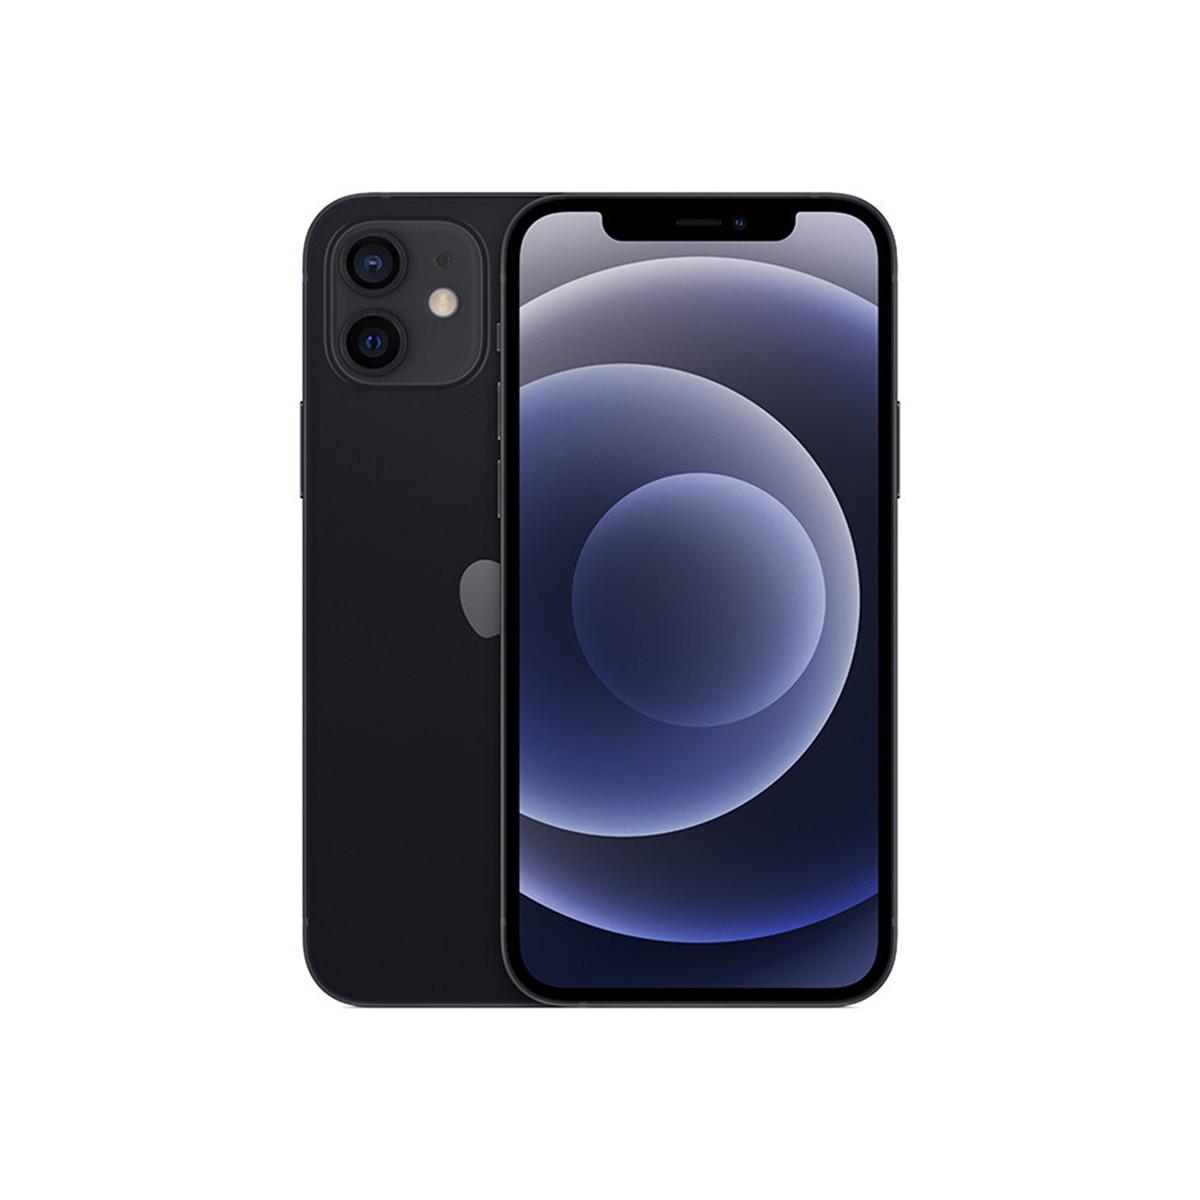 Apple 苹果 iPhone 12 双卡双待 5G智能手机 128GB  ¥6198 多色可选